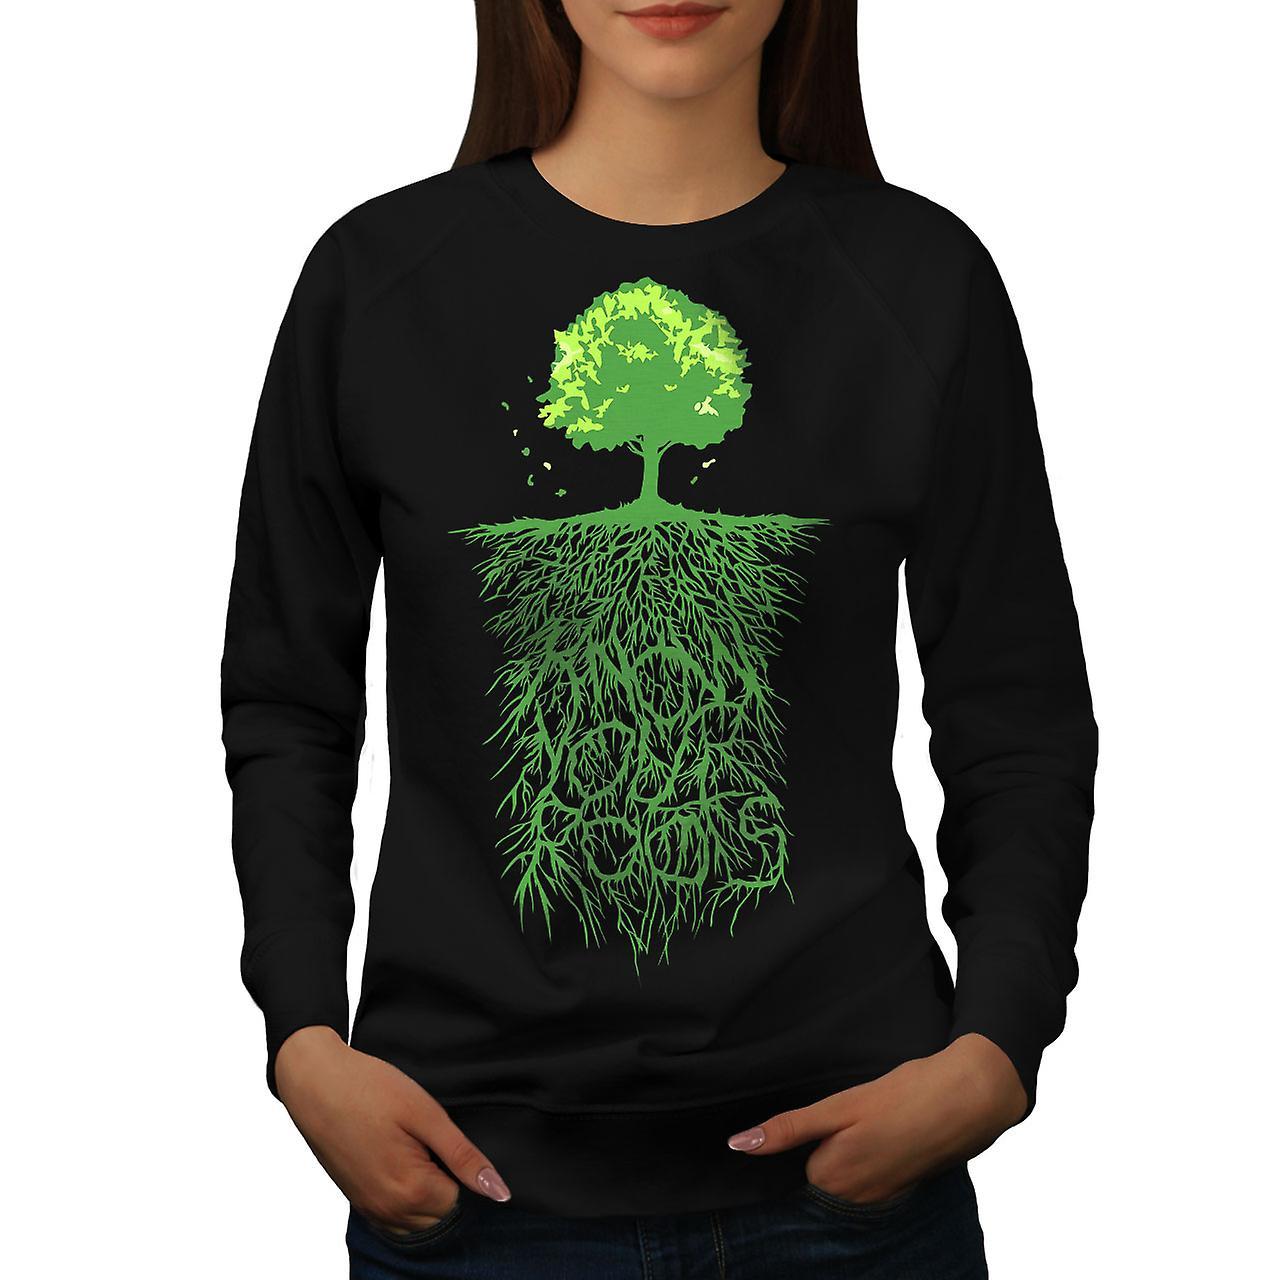 Terre arbre racines Nature femmes noirSweatshirt